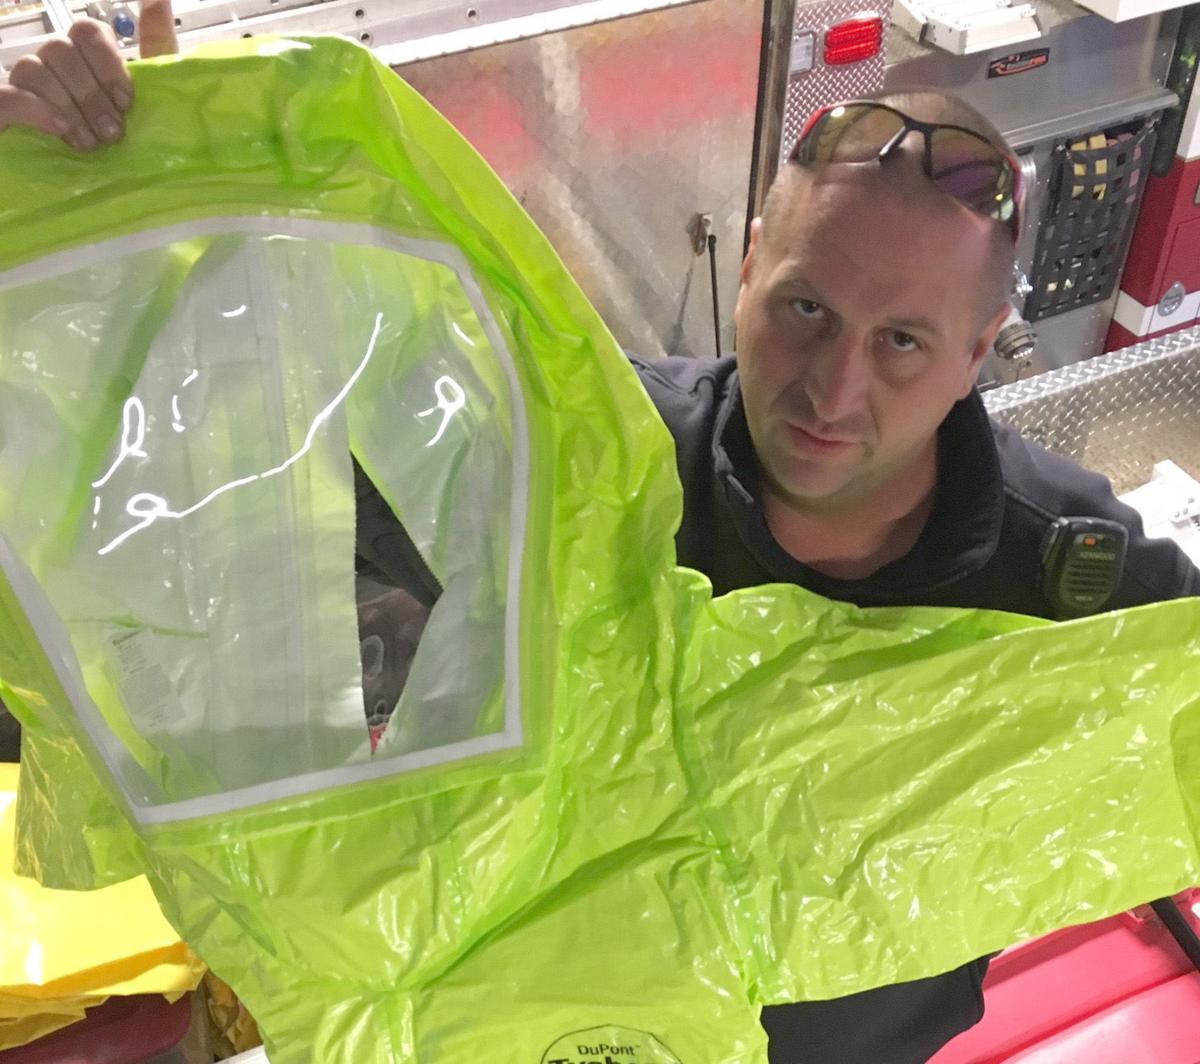 Region's first responders take precautions against opioid menace